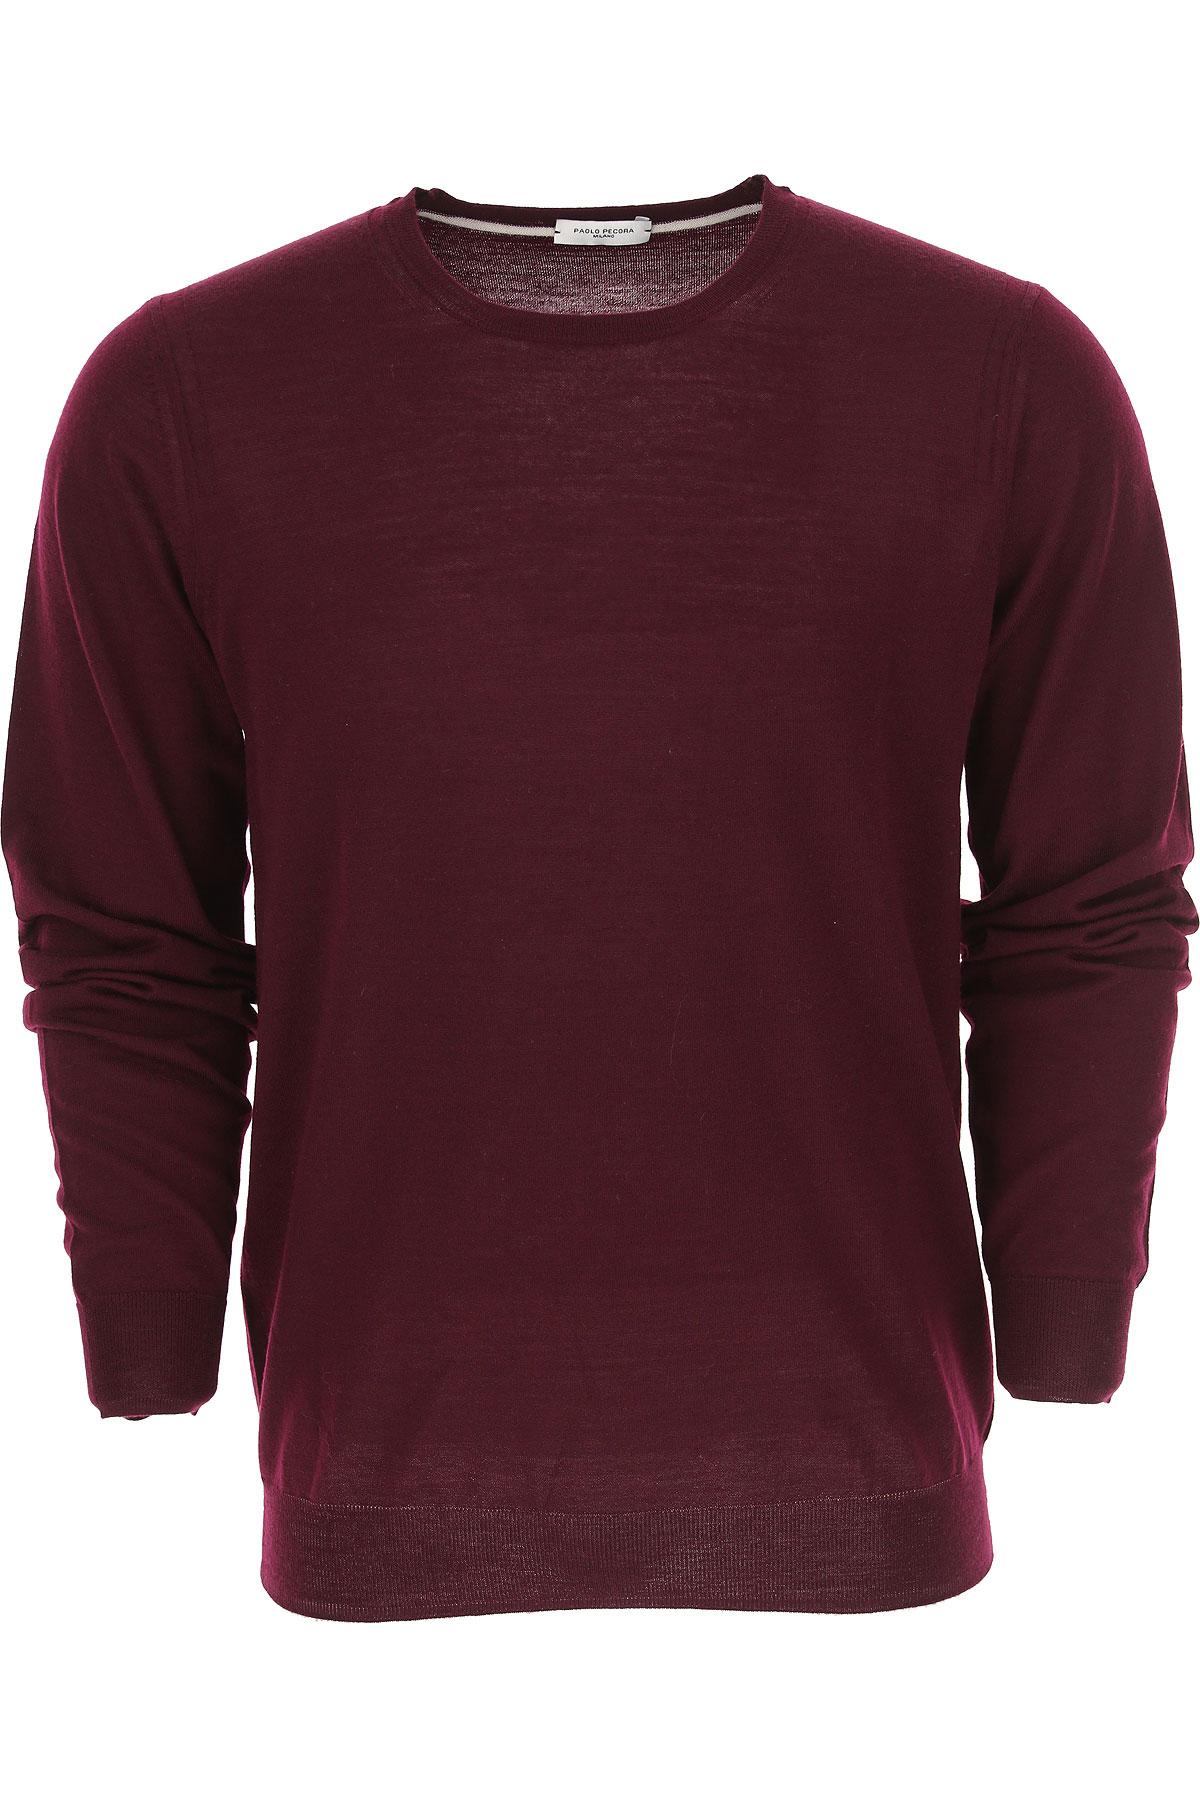 Paolo Pecora Sweater for Men Jumper On Sale, Bordeaux Wine, Wool, 2017, L M XL